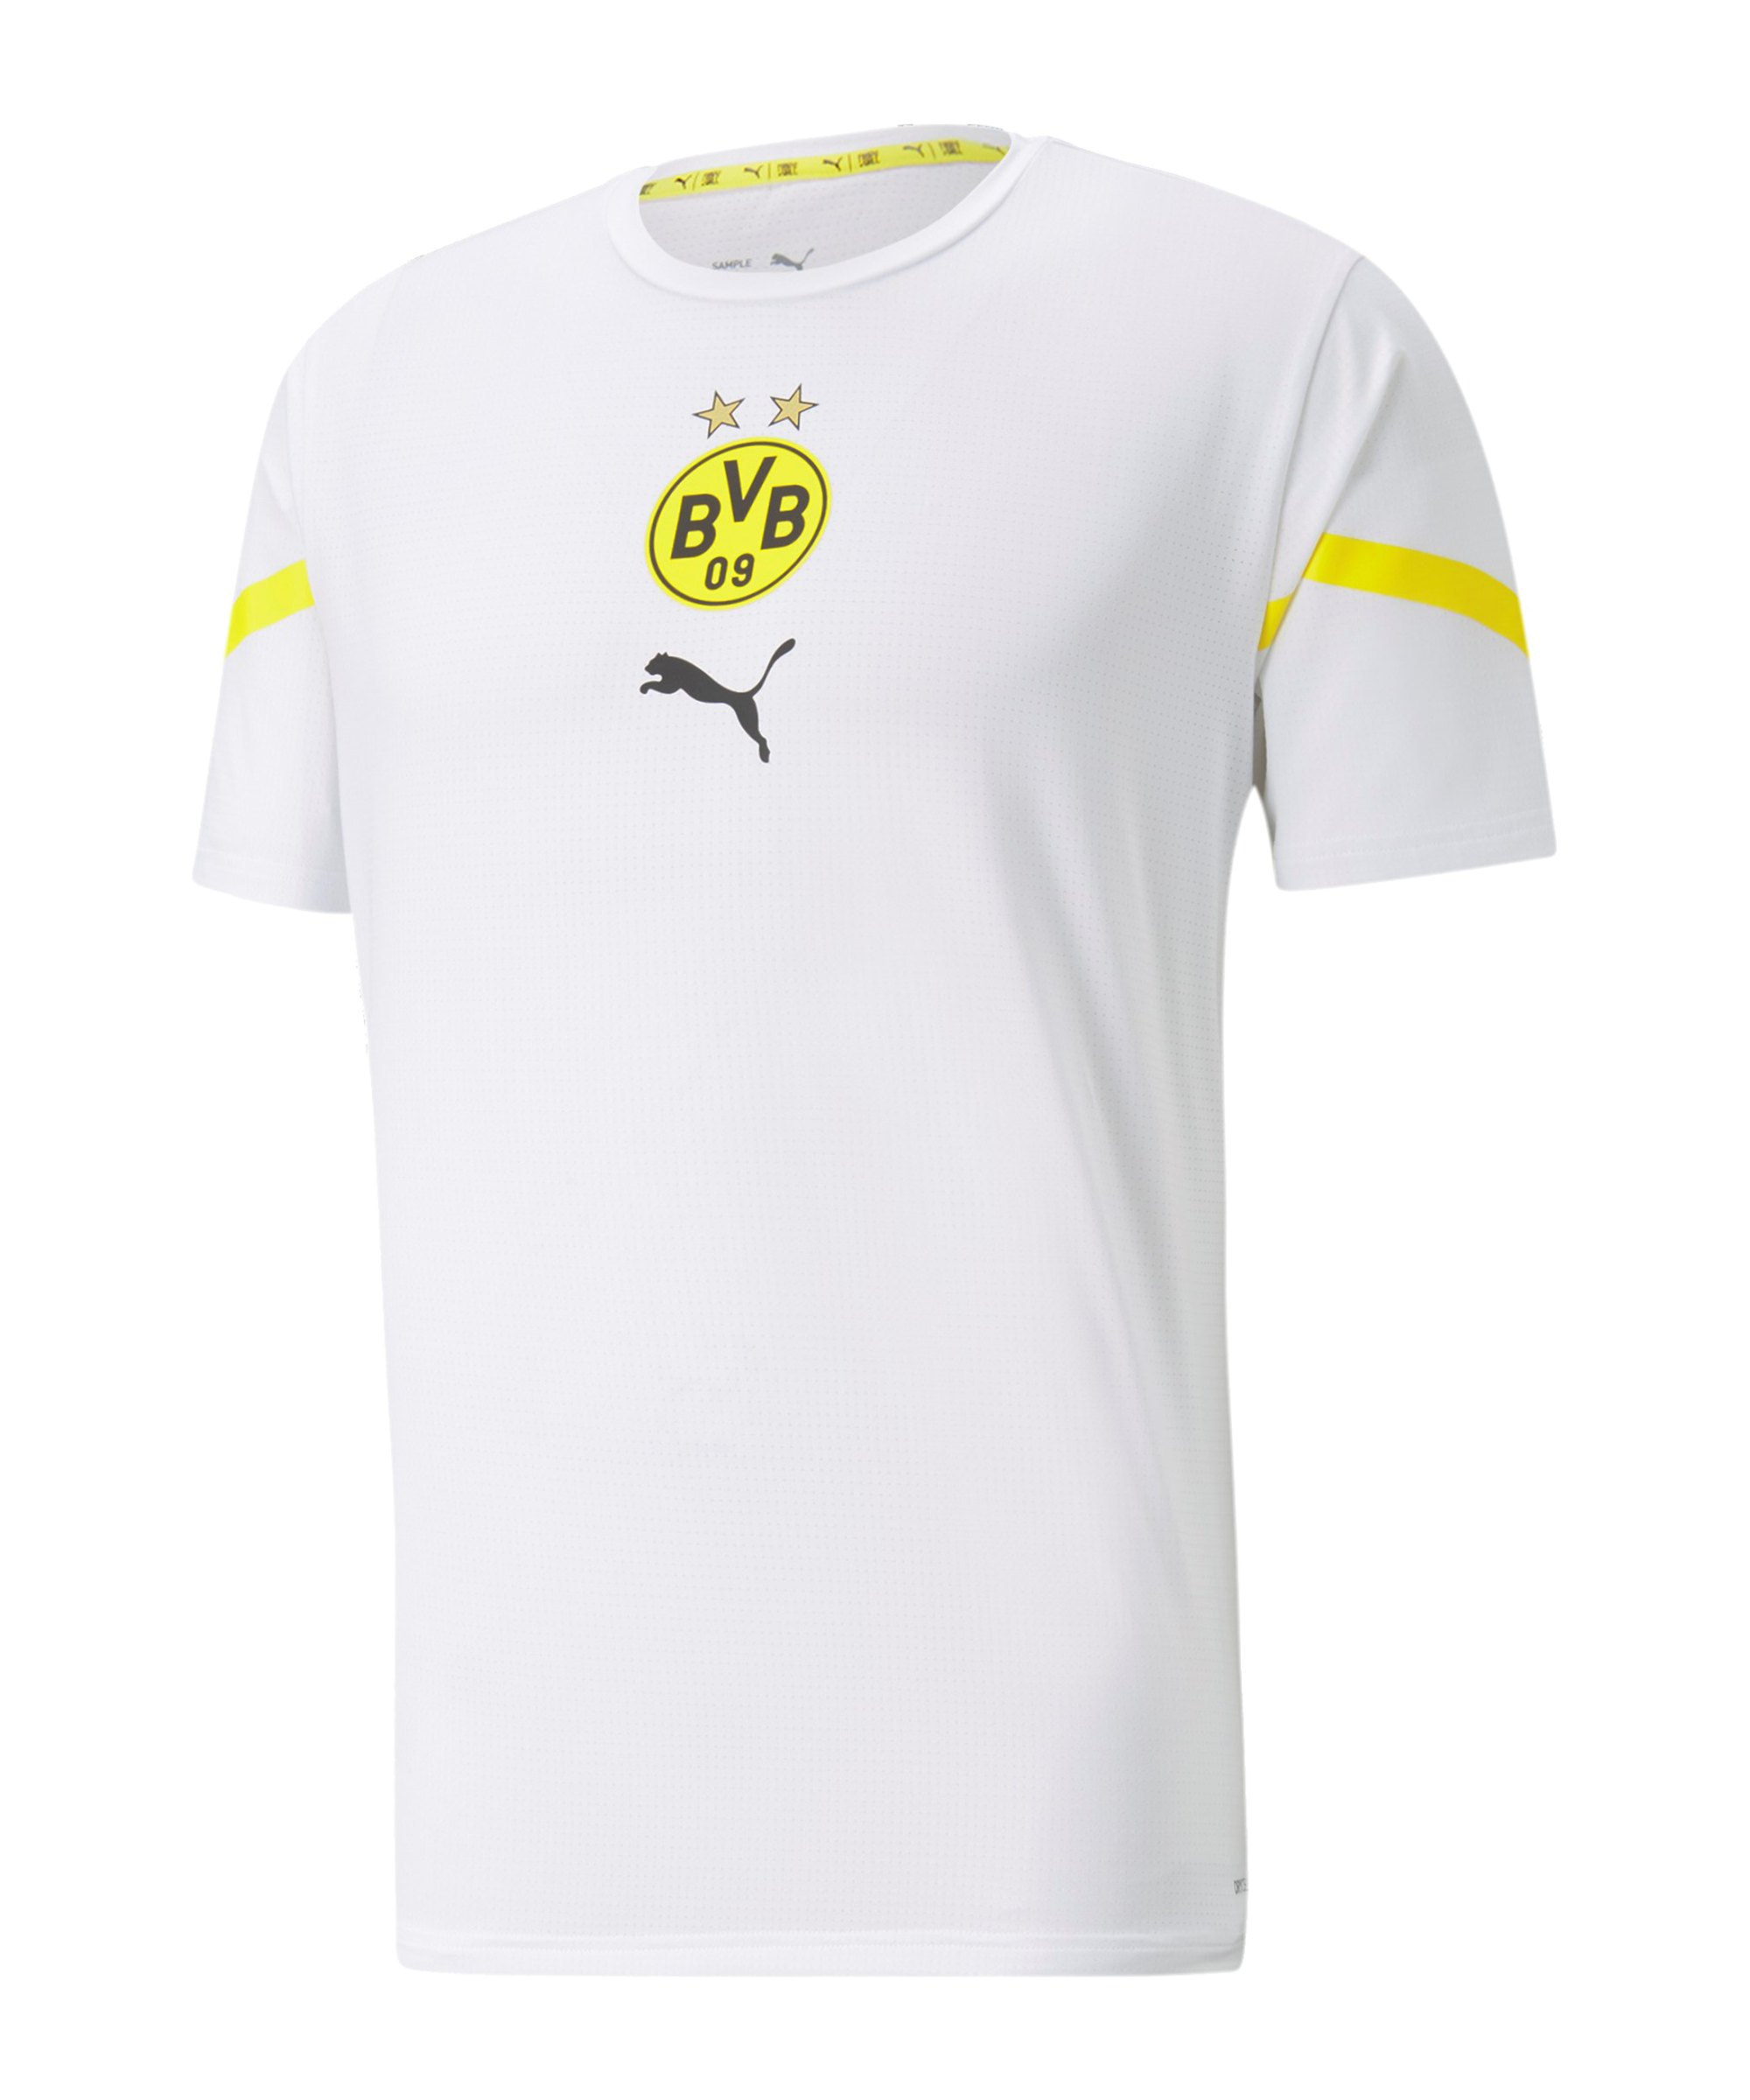 PUMA BVB Dortmund Prematch Shirt 2021/2022 Weiss Gelb F08 - weiss